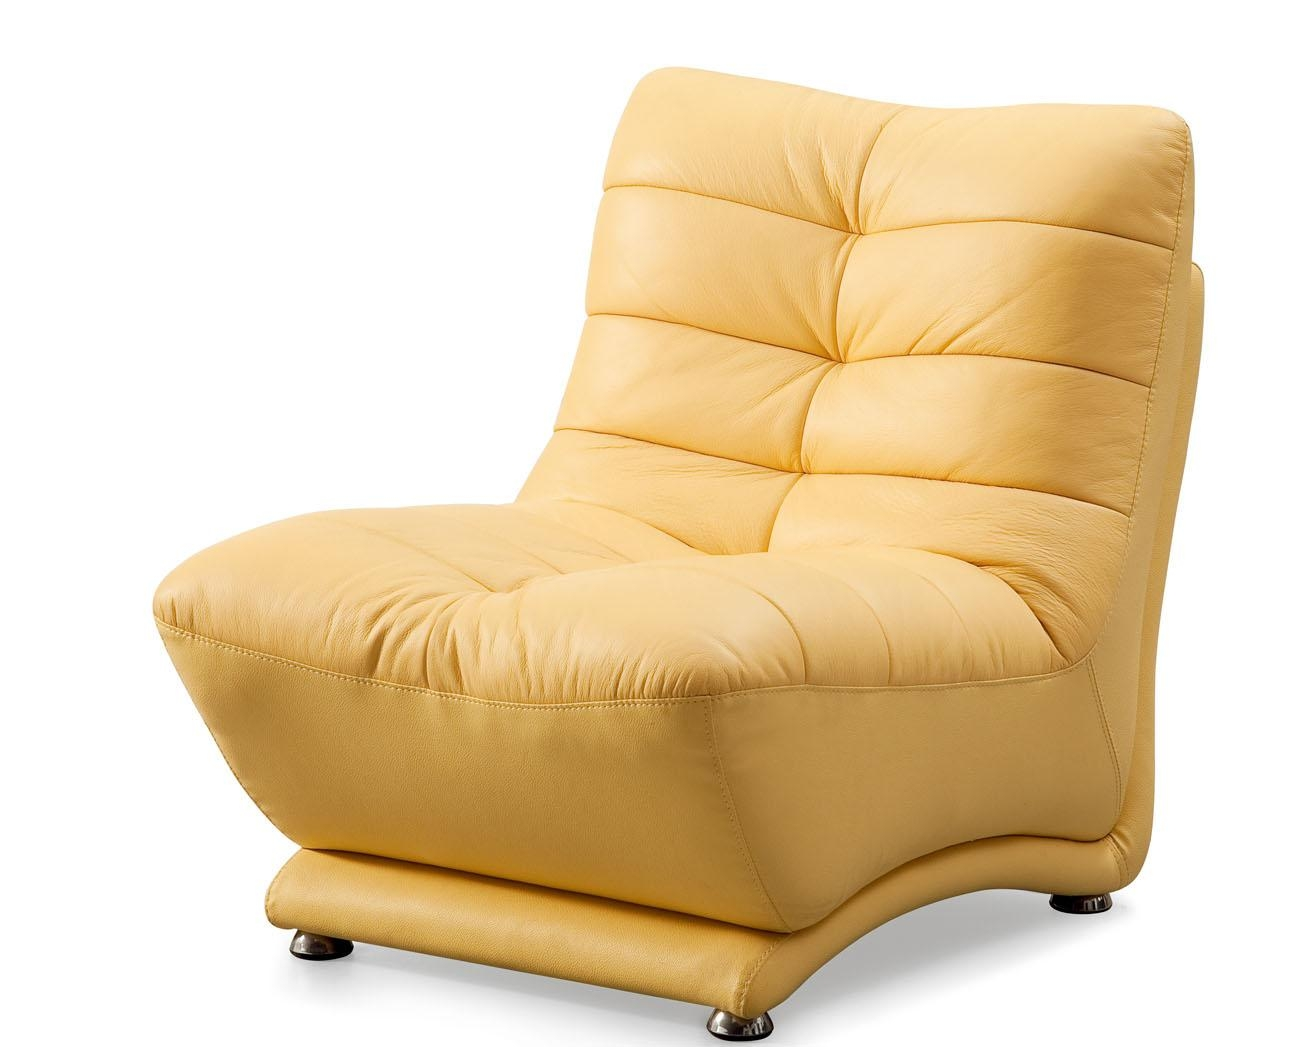 Furniture Home : Sofa Chairs Furniture Designs (30) Modern Elegant Inside Sofa Chairs (View 12 of 20)